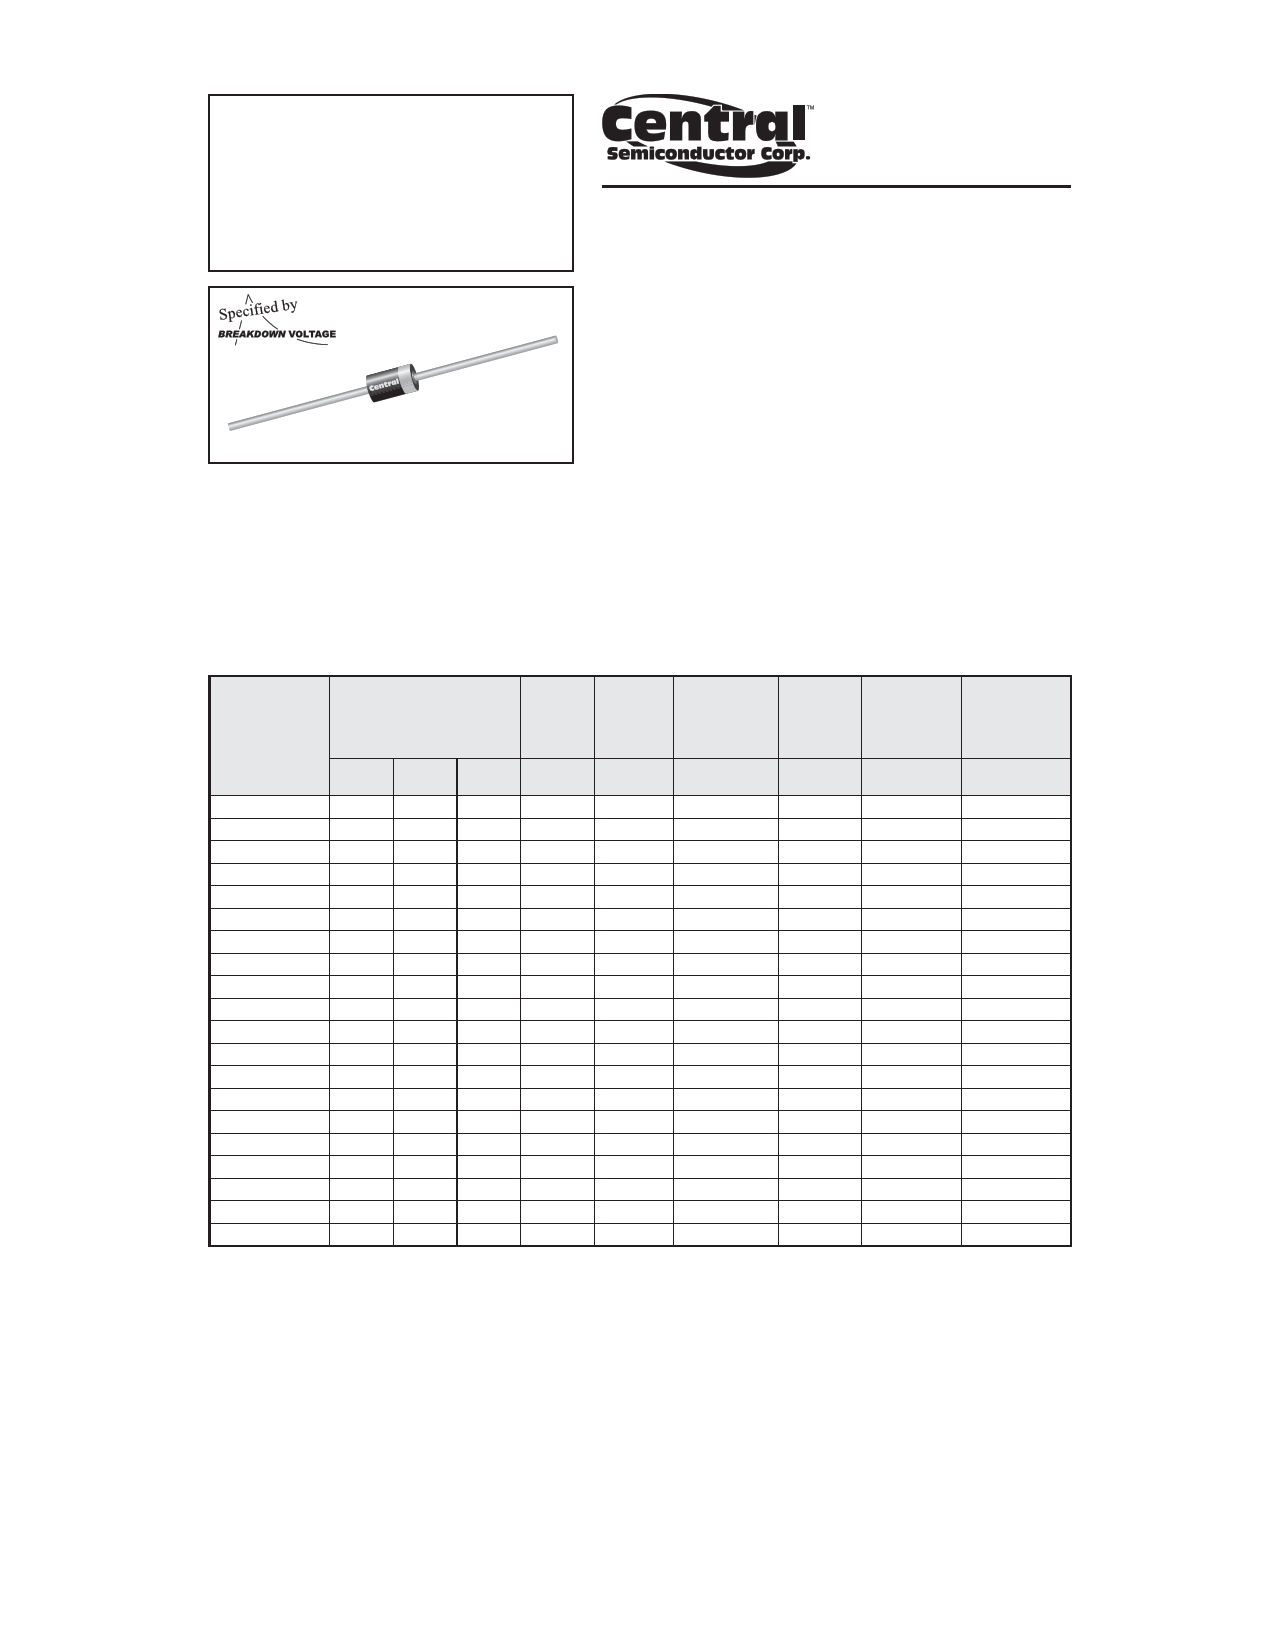 1.5CE6.8A datasheet